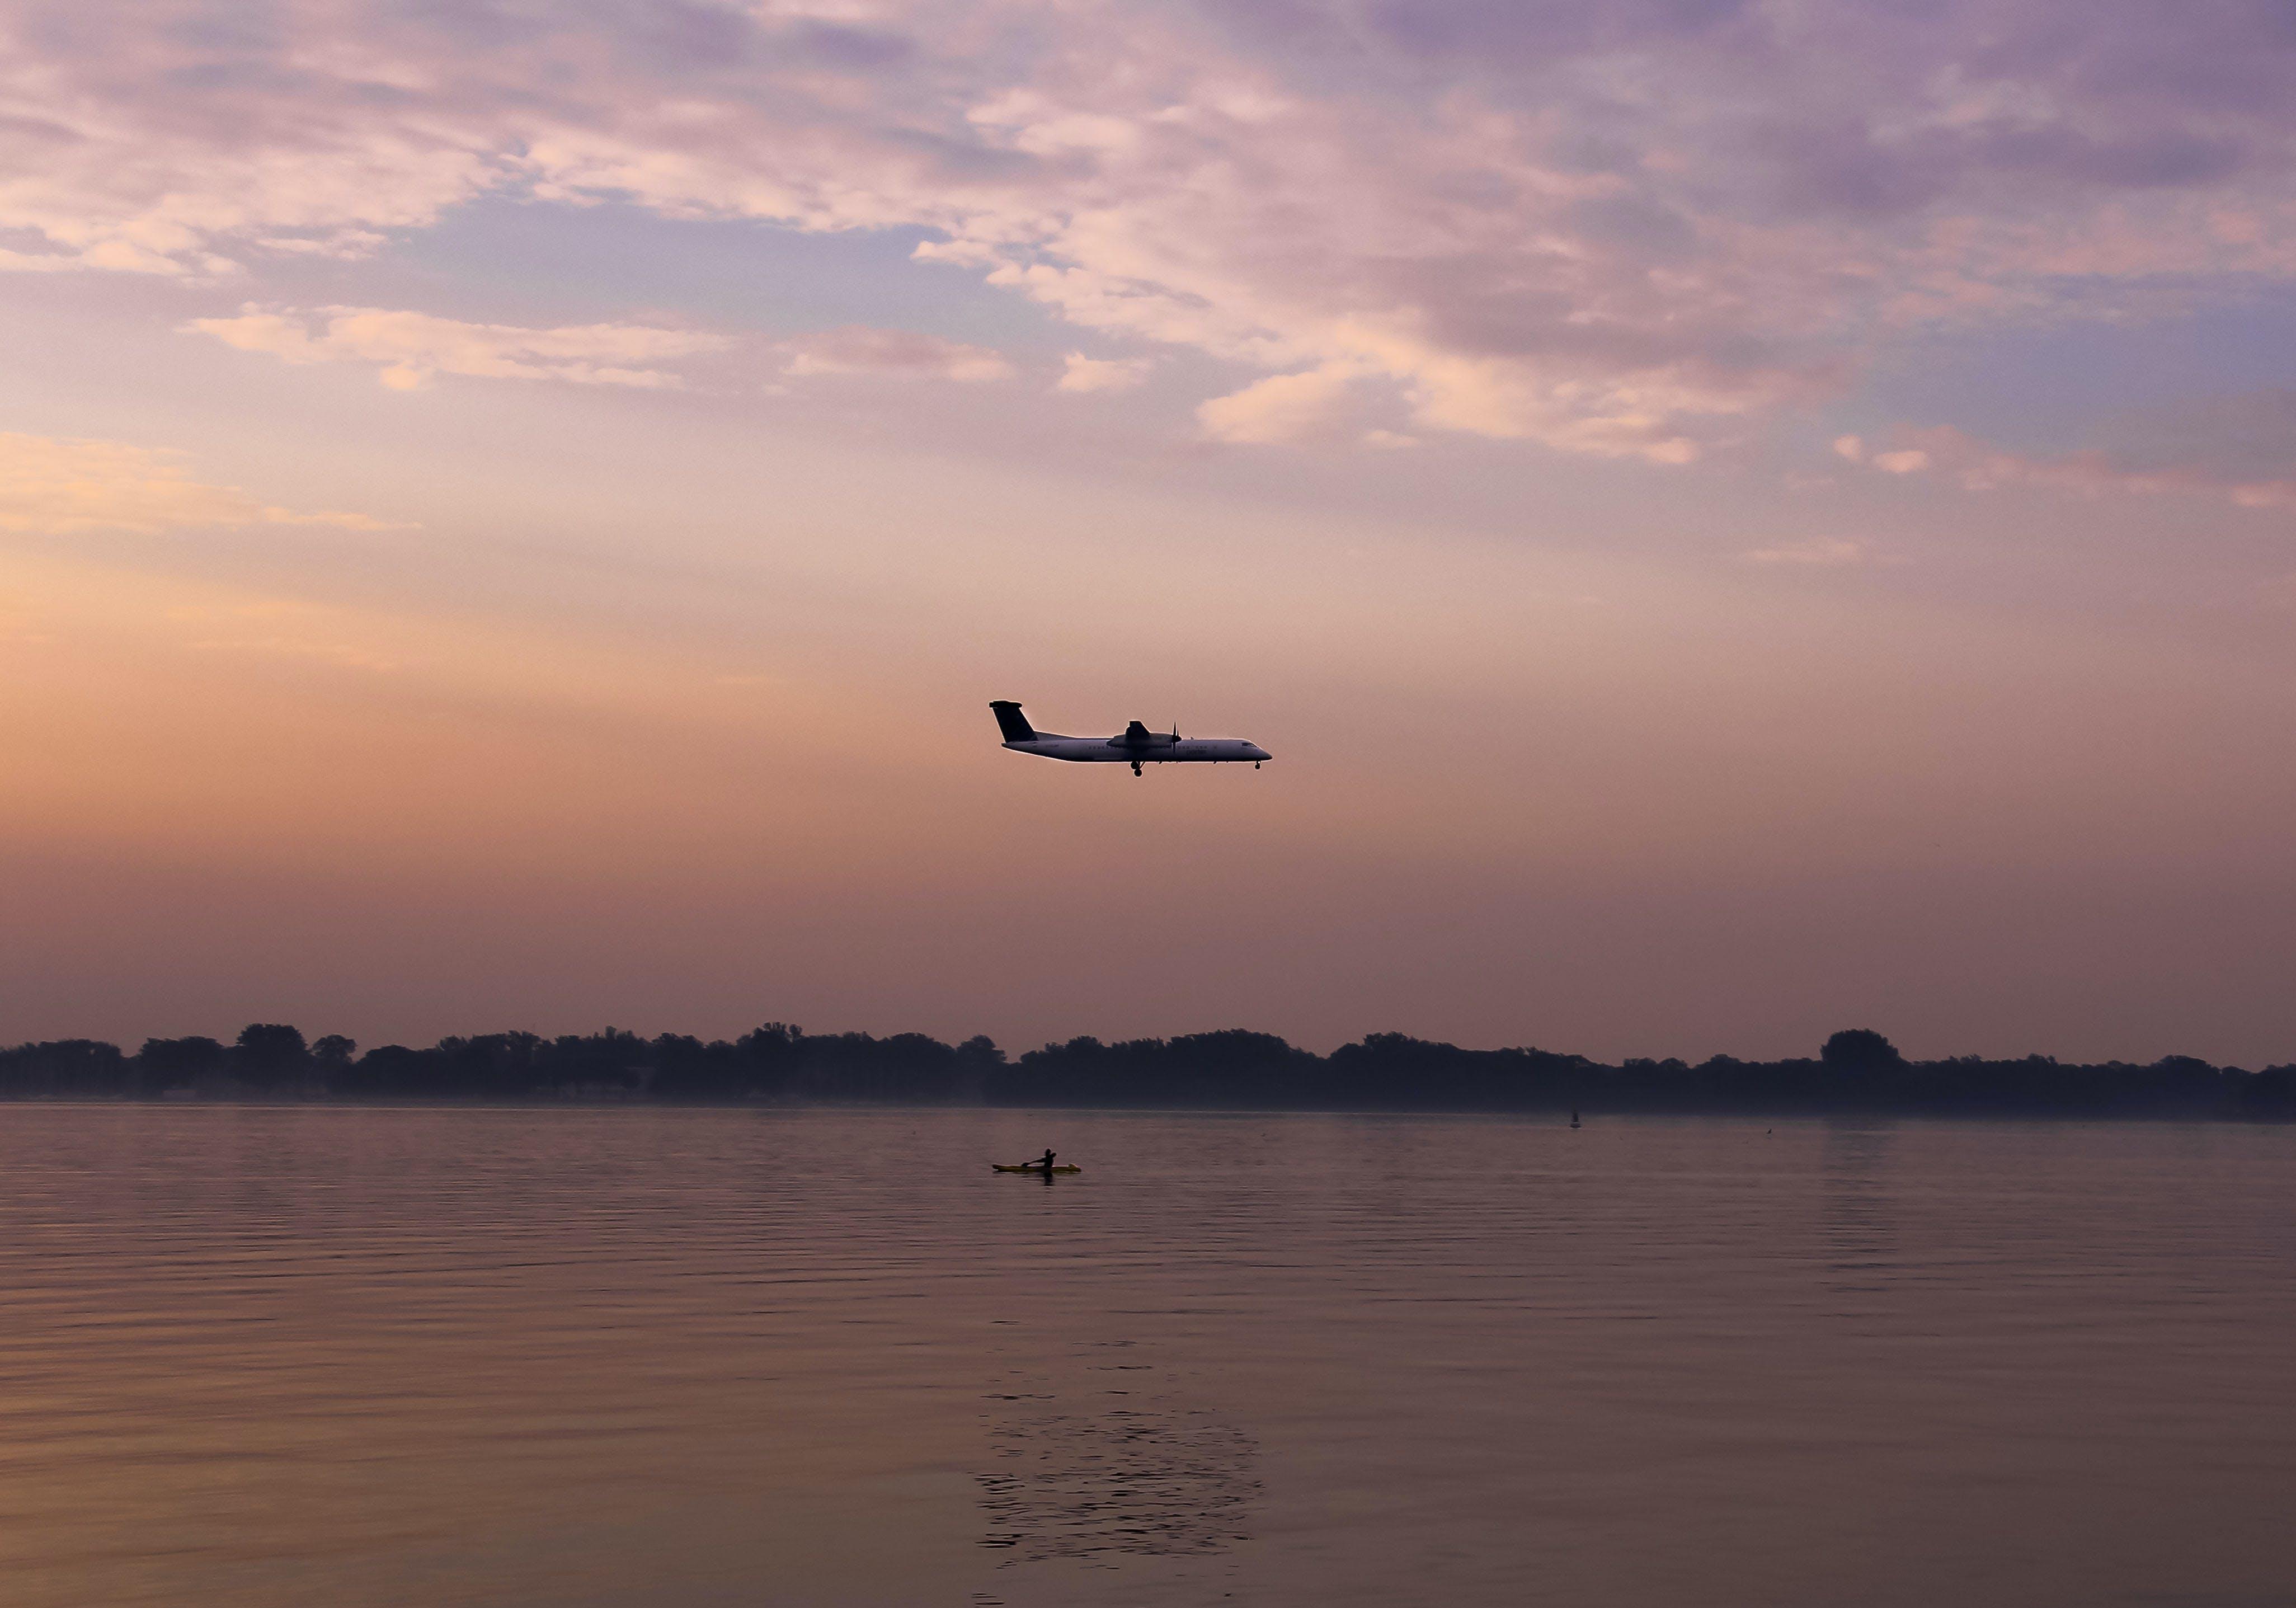 Free stock photo of flying, Island Airport, kayak, plane